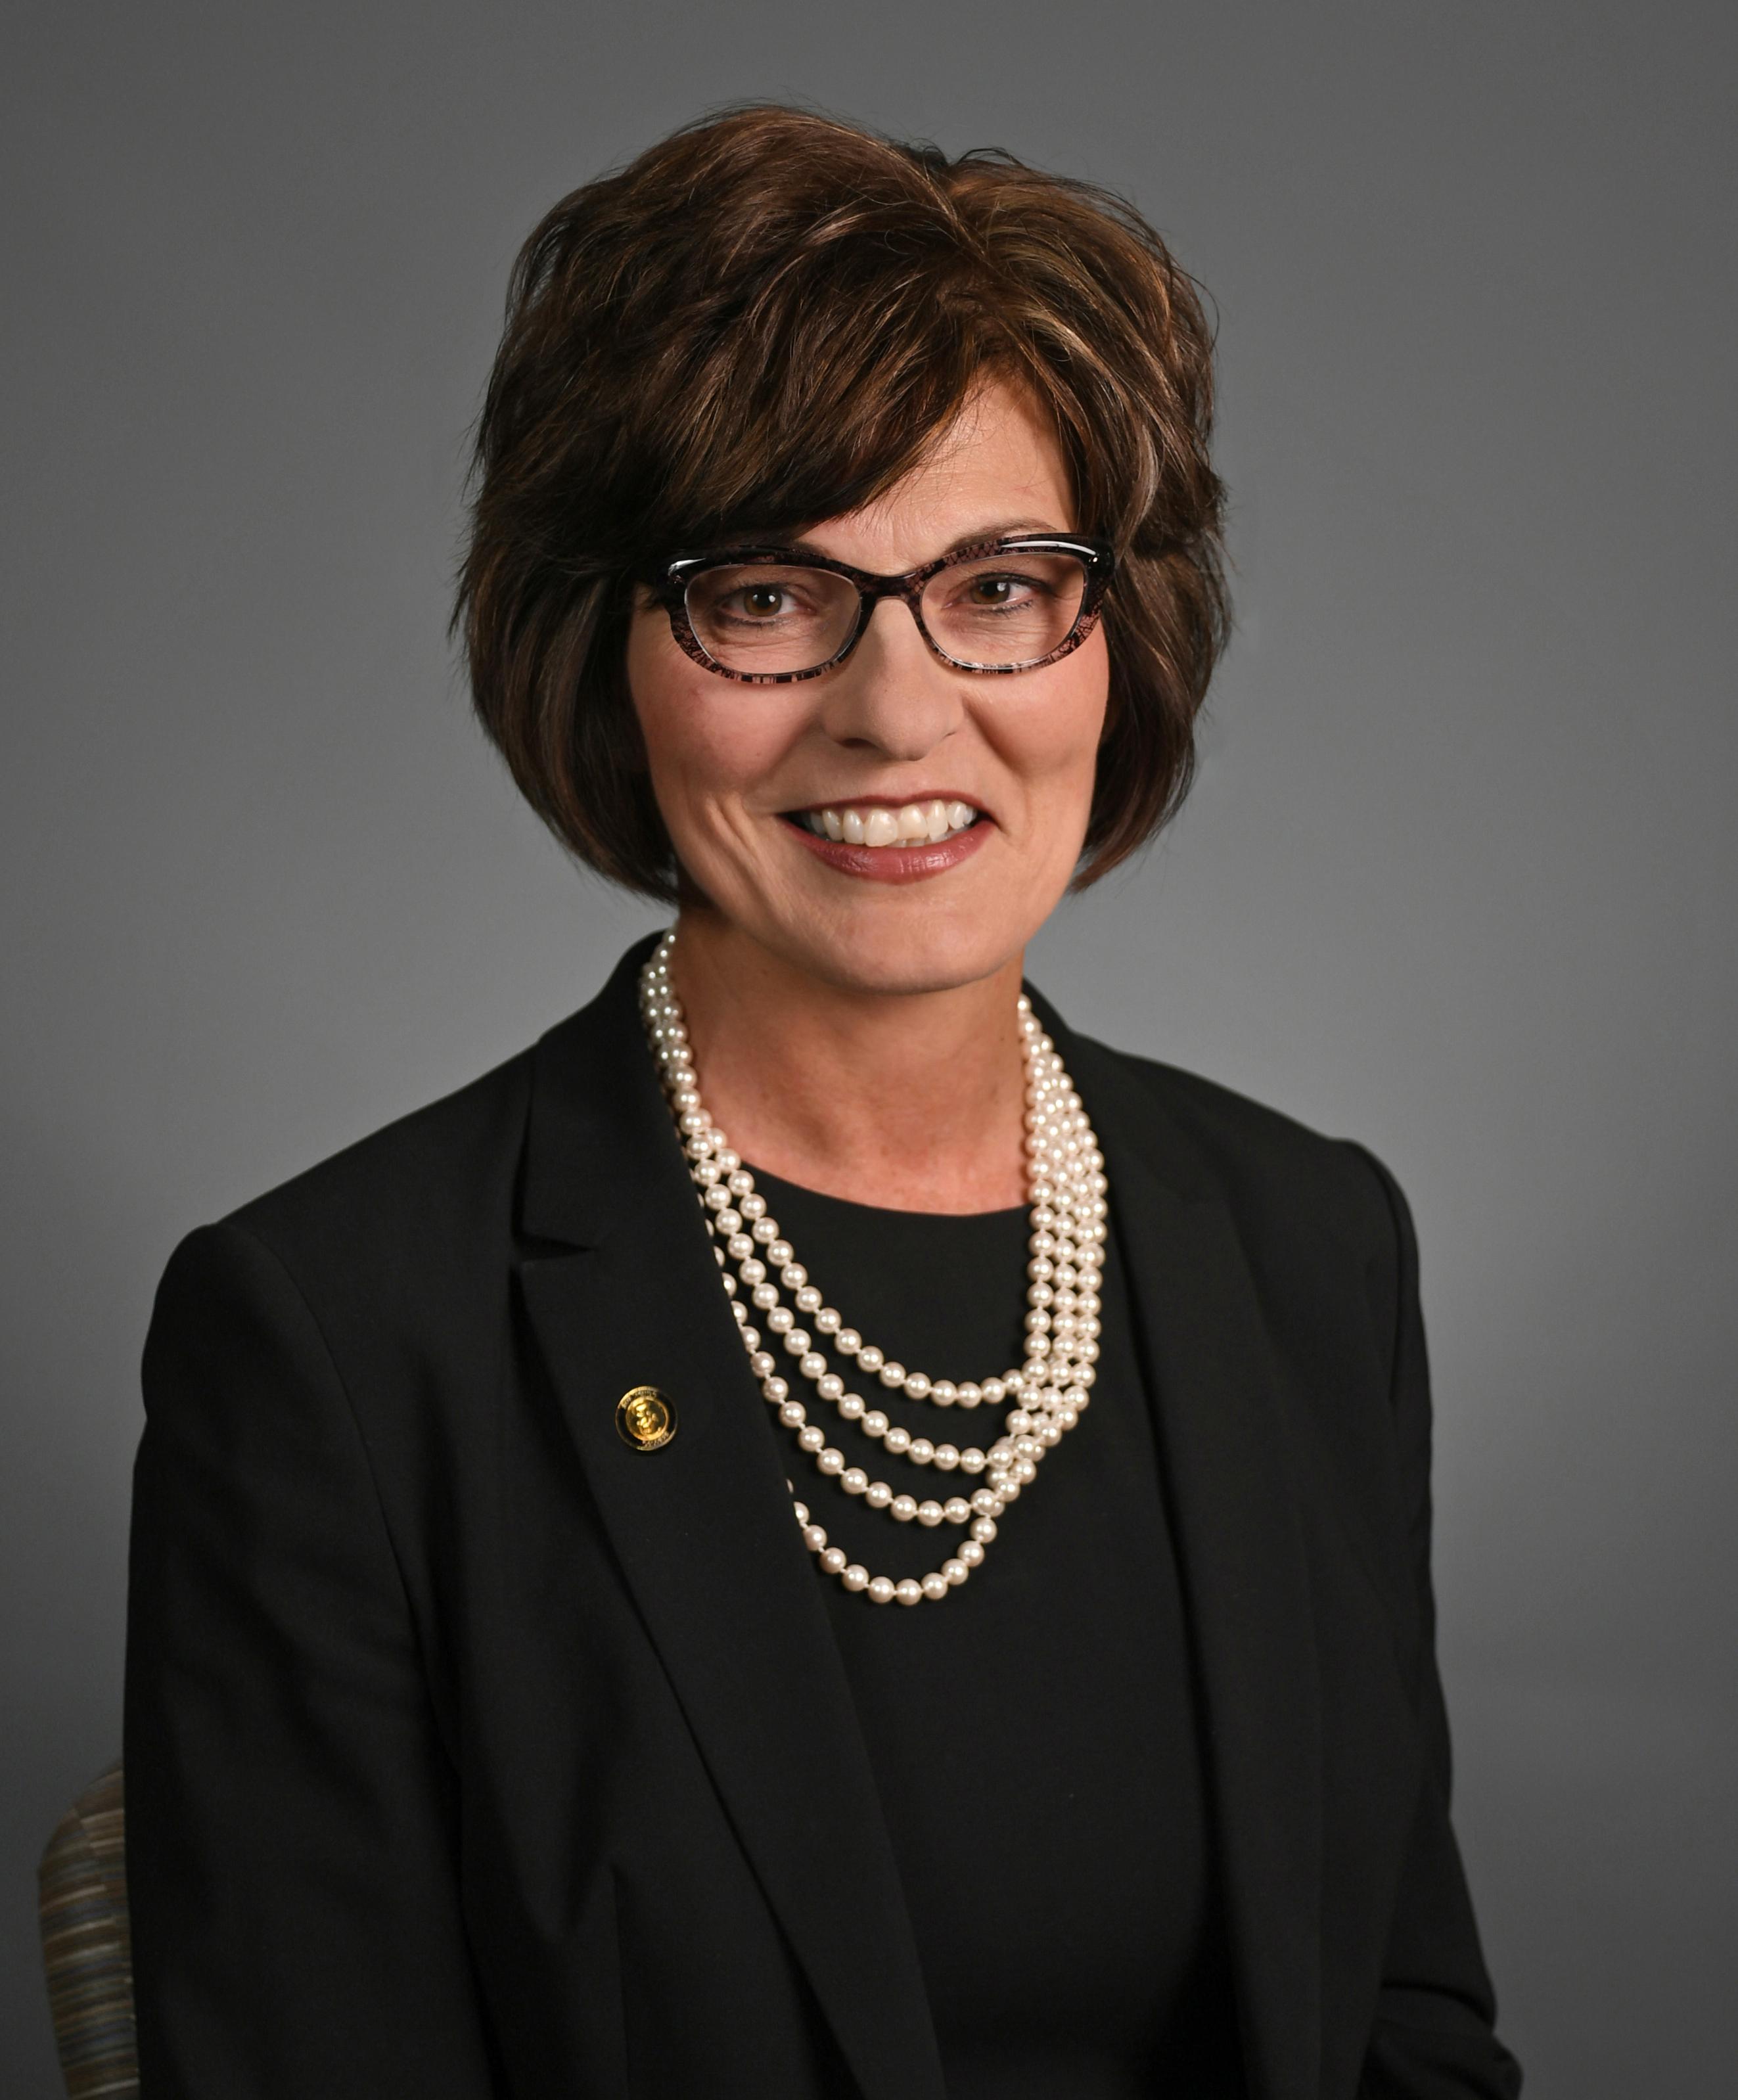 Dr Brenda Hellyer